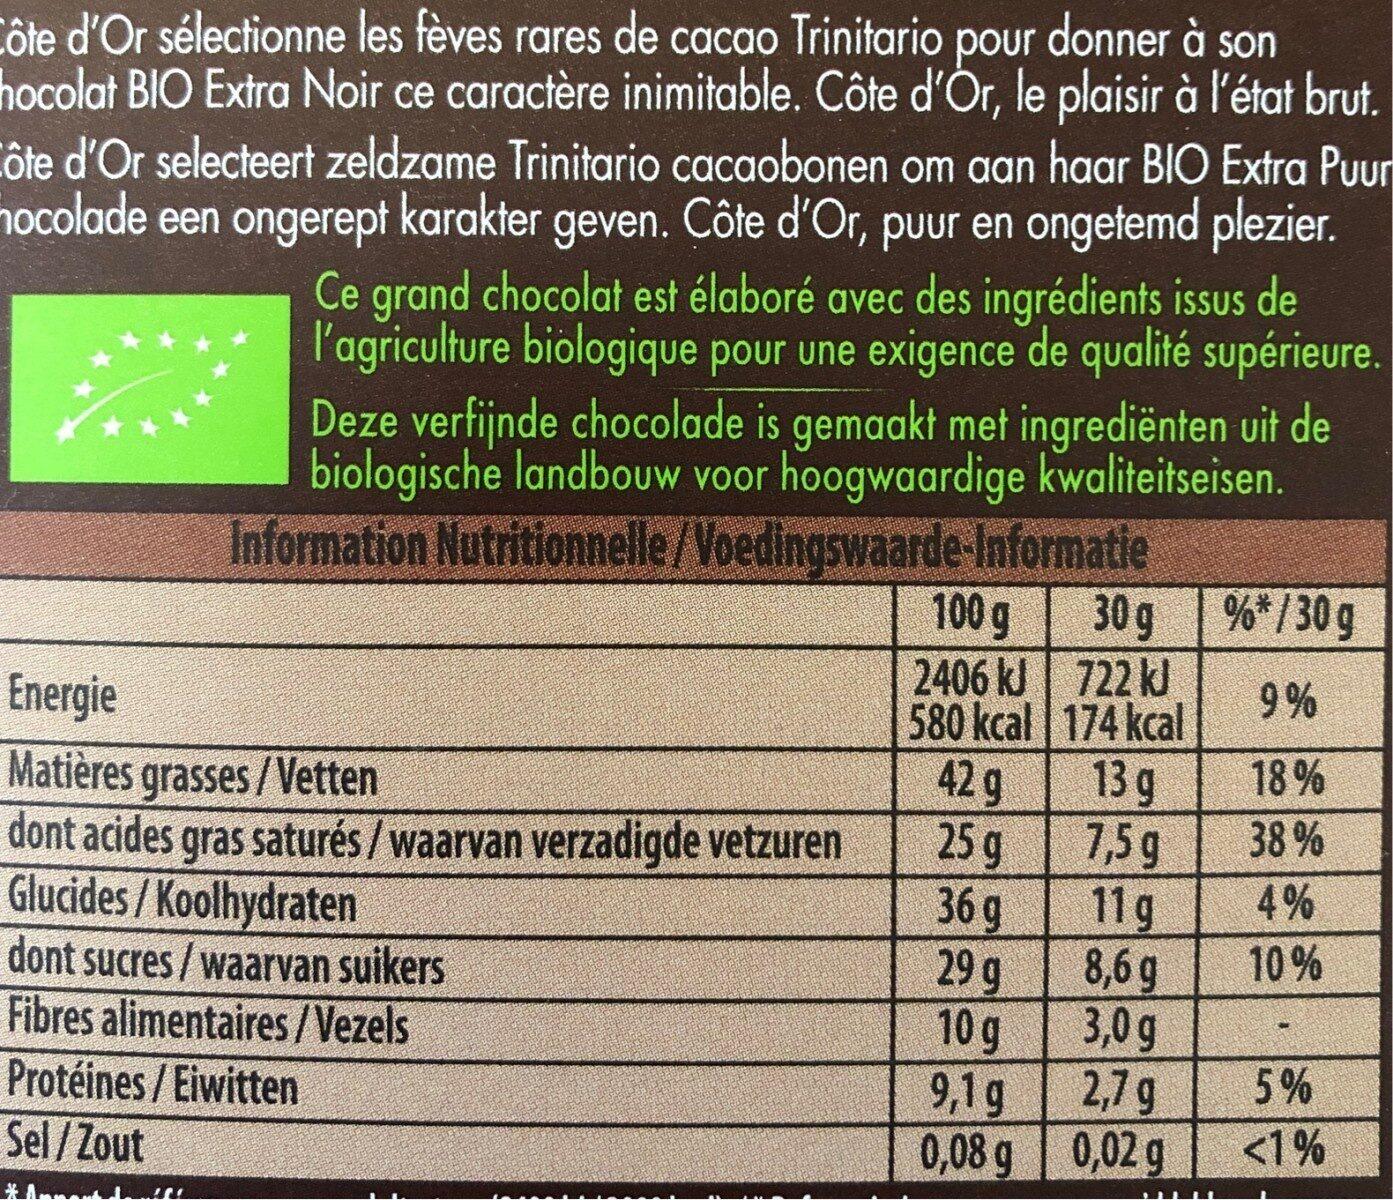 Bio extra noir - Informations nutritionnelles - fr